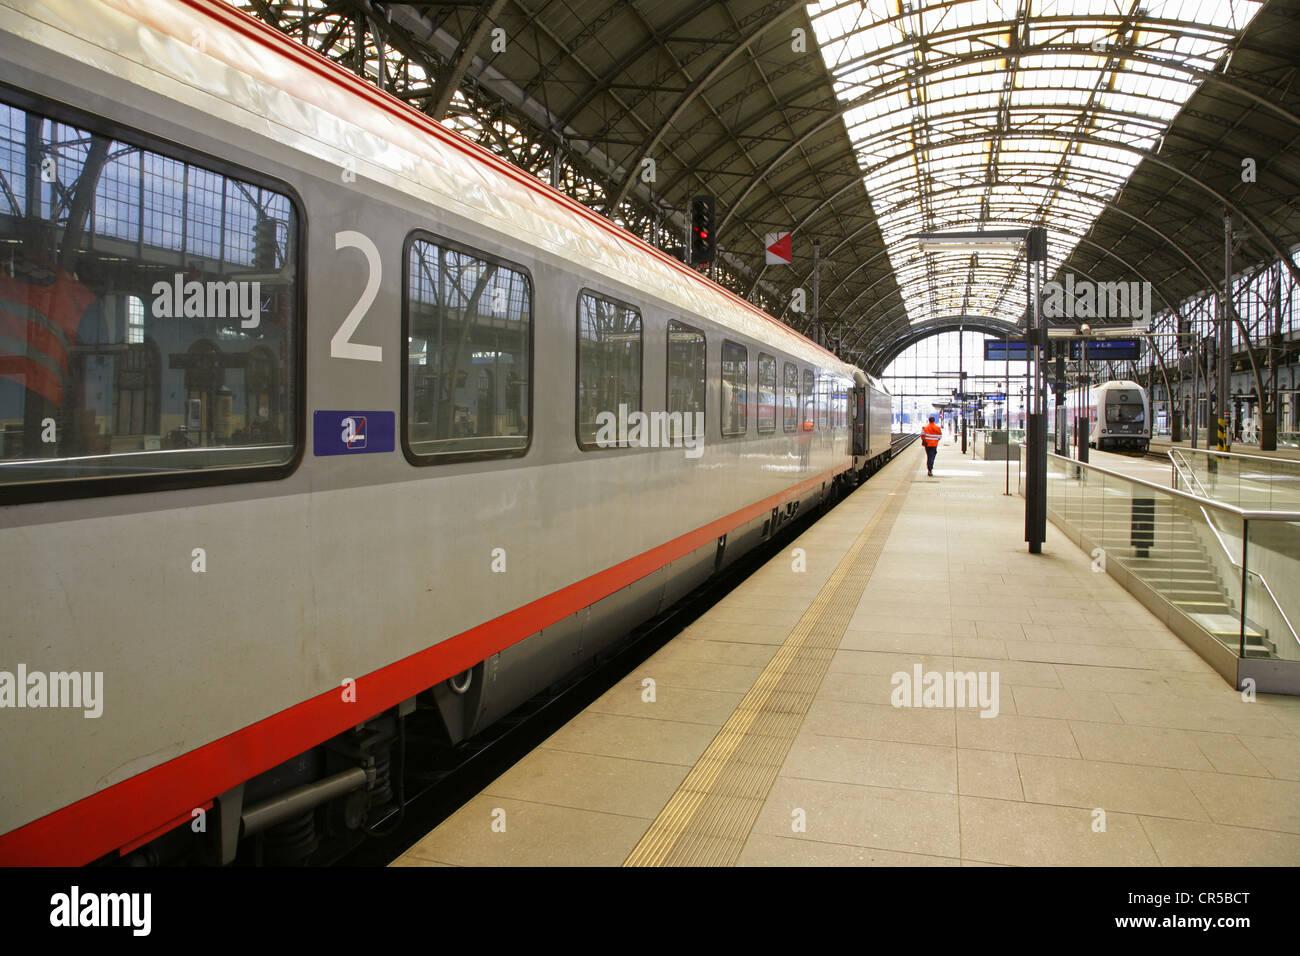 Modern Austrian railways 2nd class carriage at Prague central railway station, Czech Republic. - Stock Image